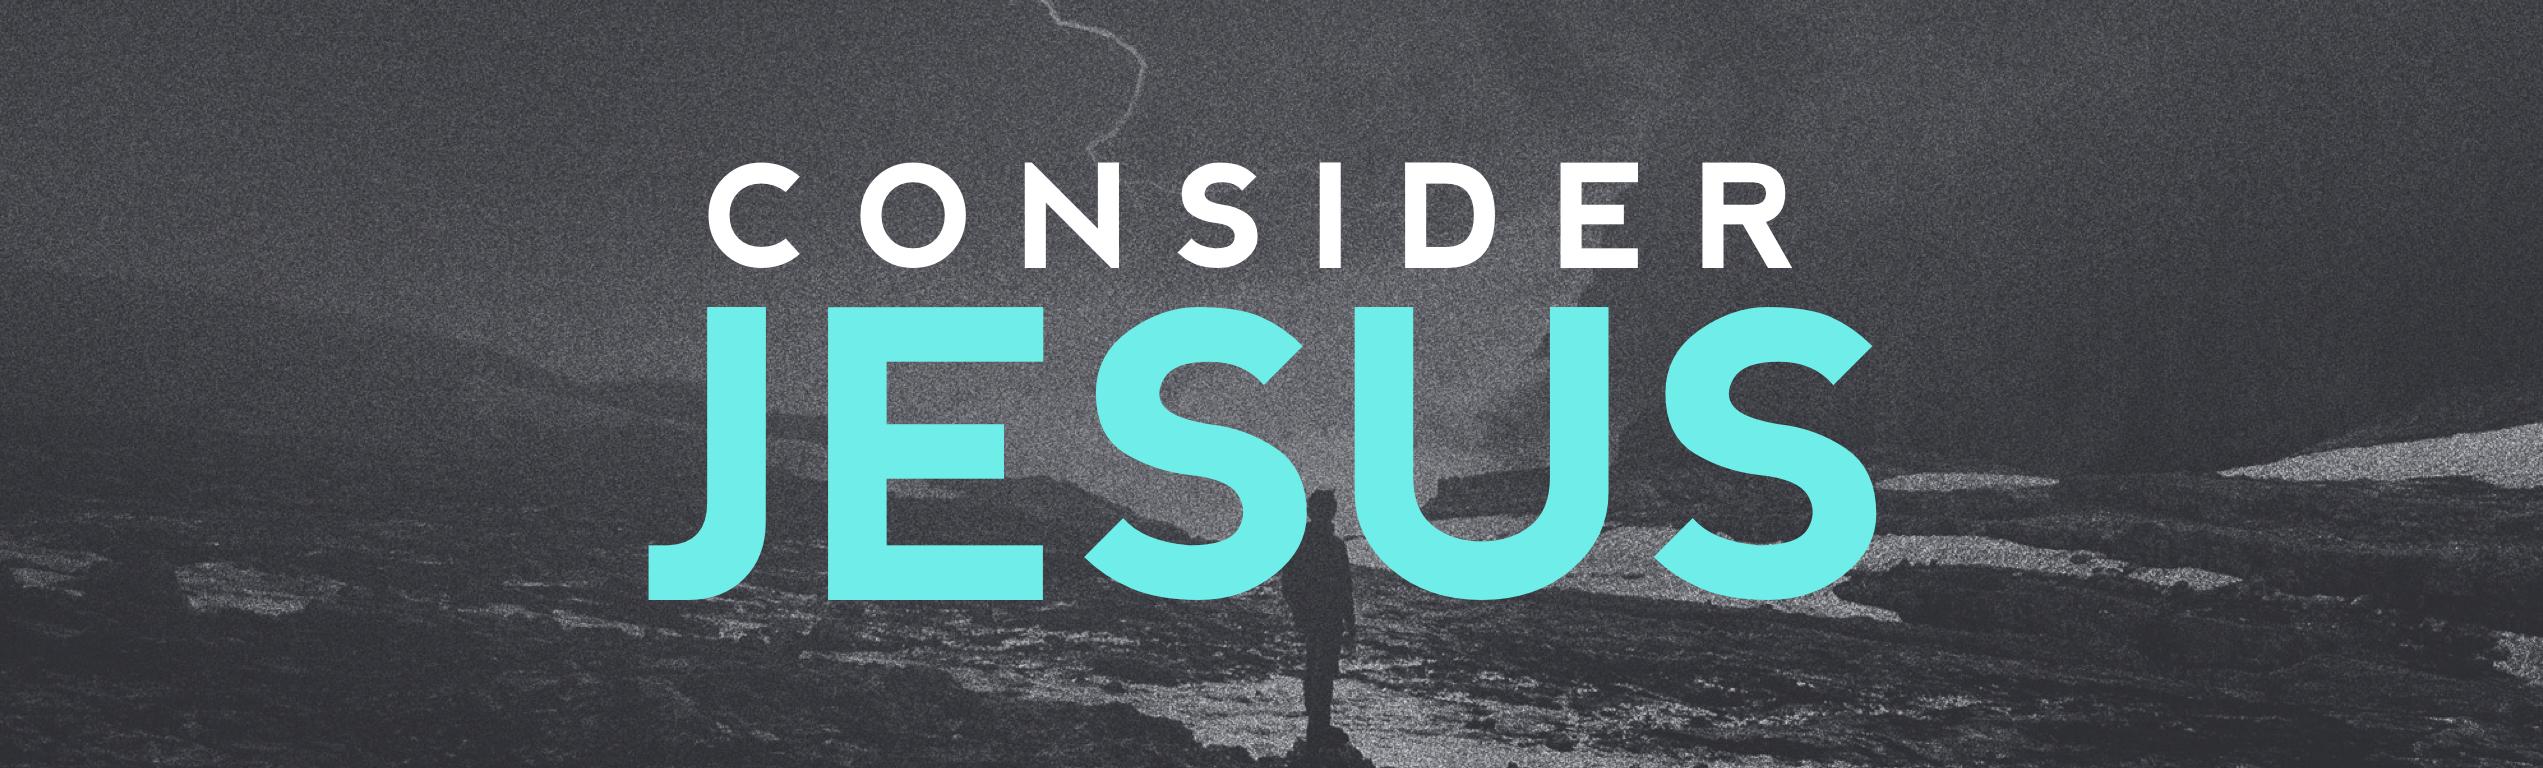 Consider Jesus Image